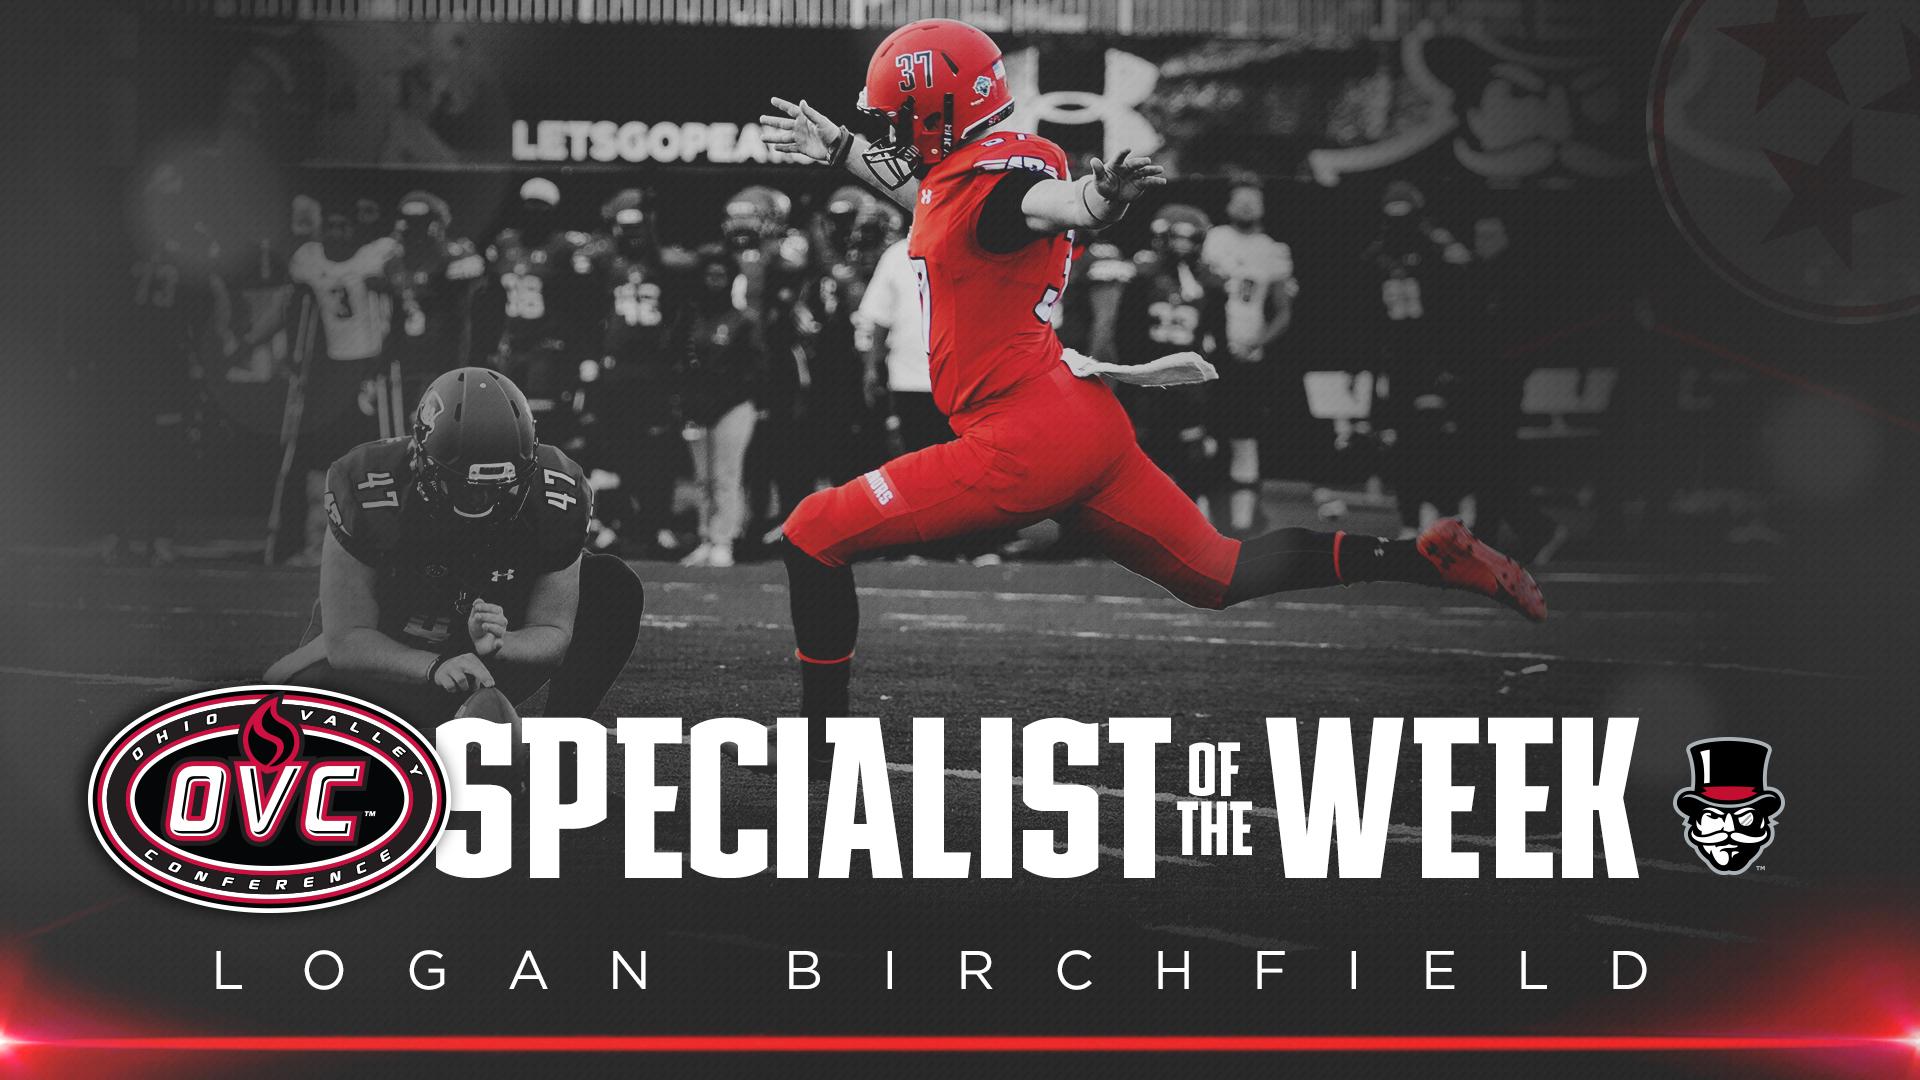 AP's Birchfield named OVC Specialist of the Week